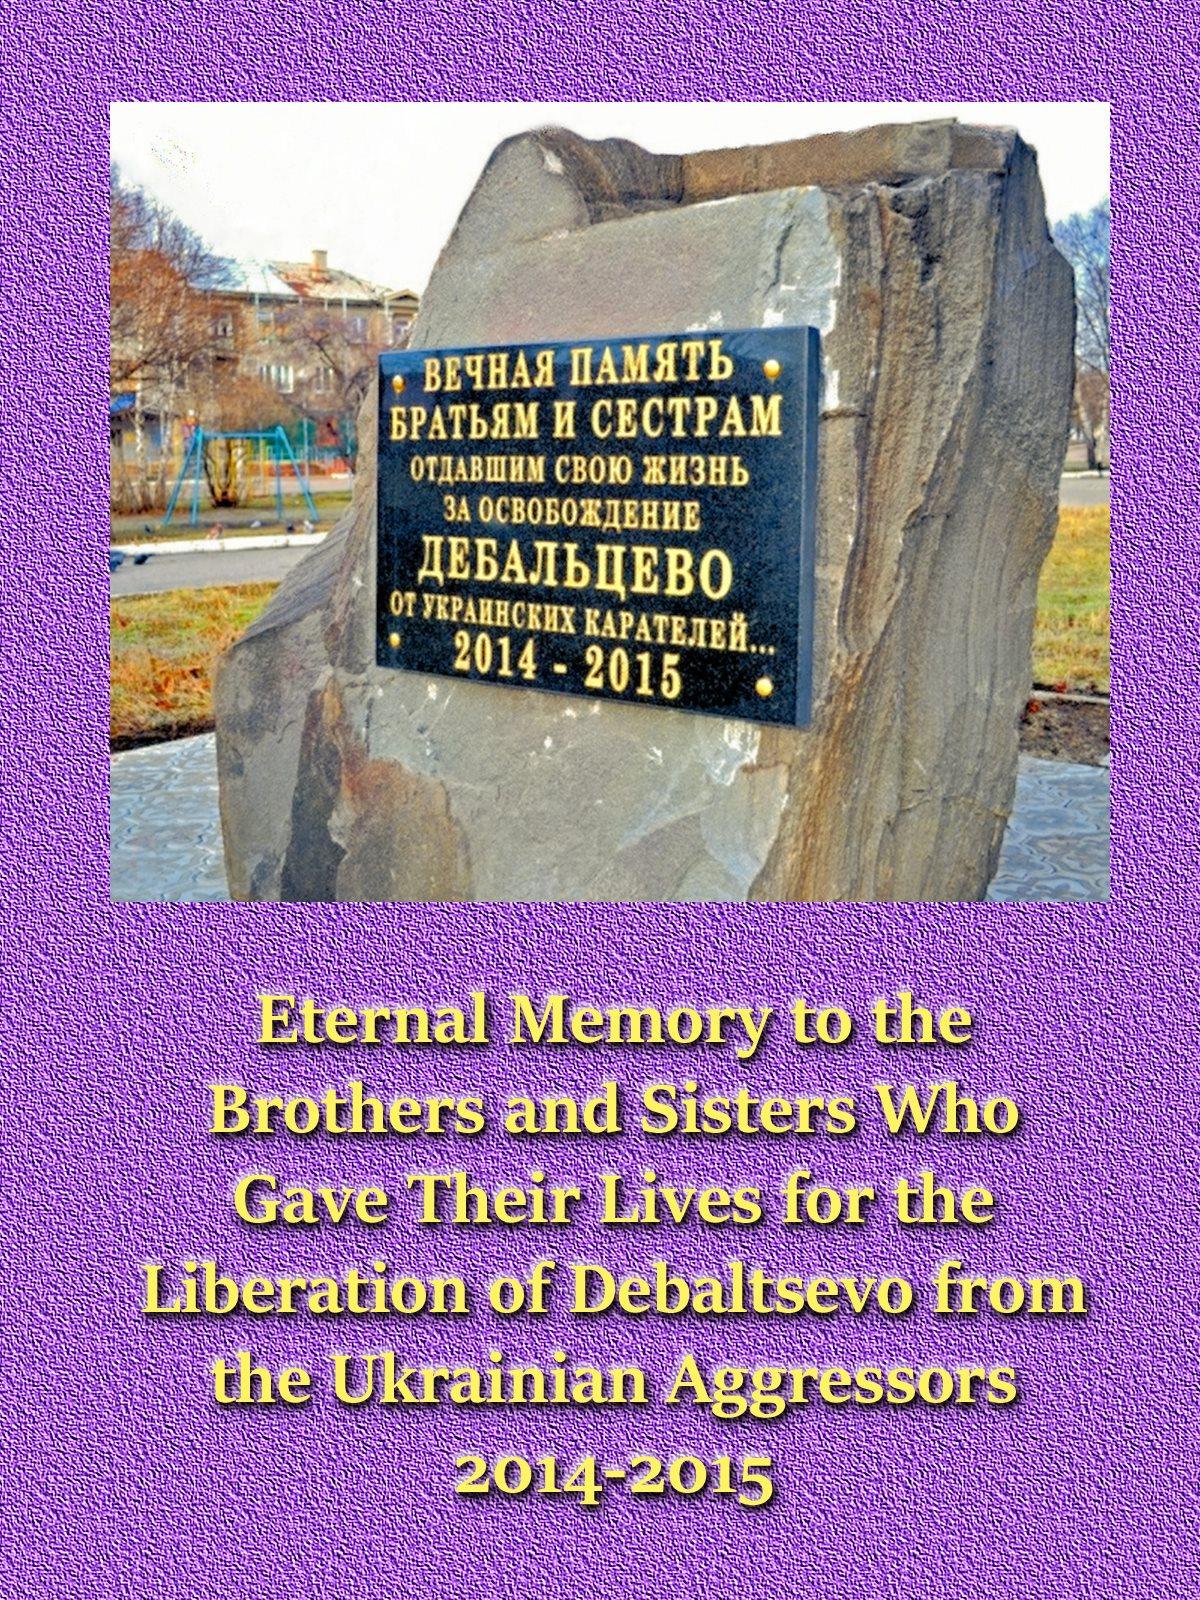 00 Debaltsevo memorial 050716 (2)